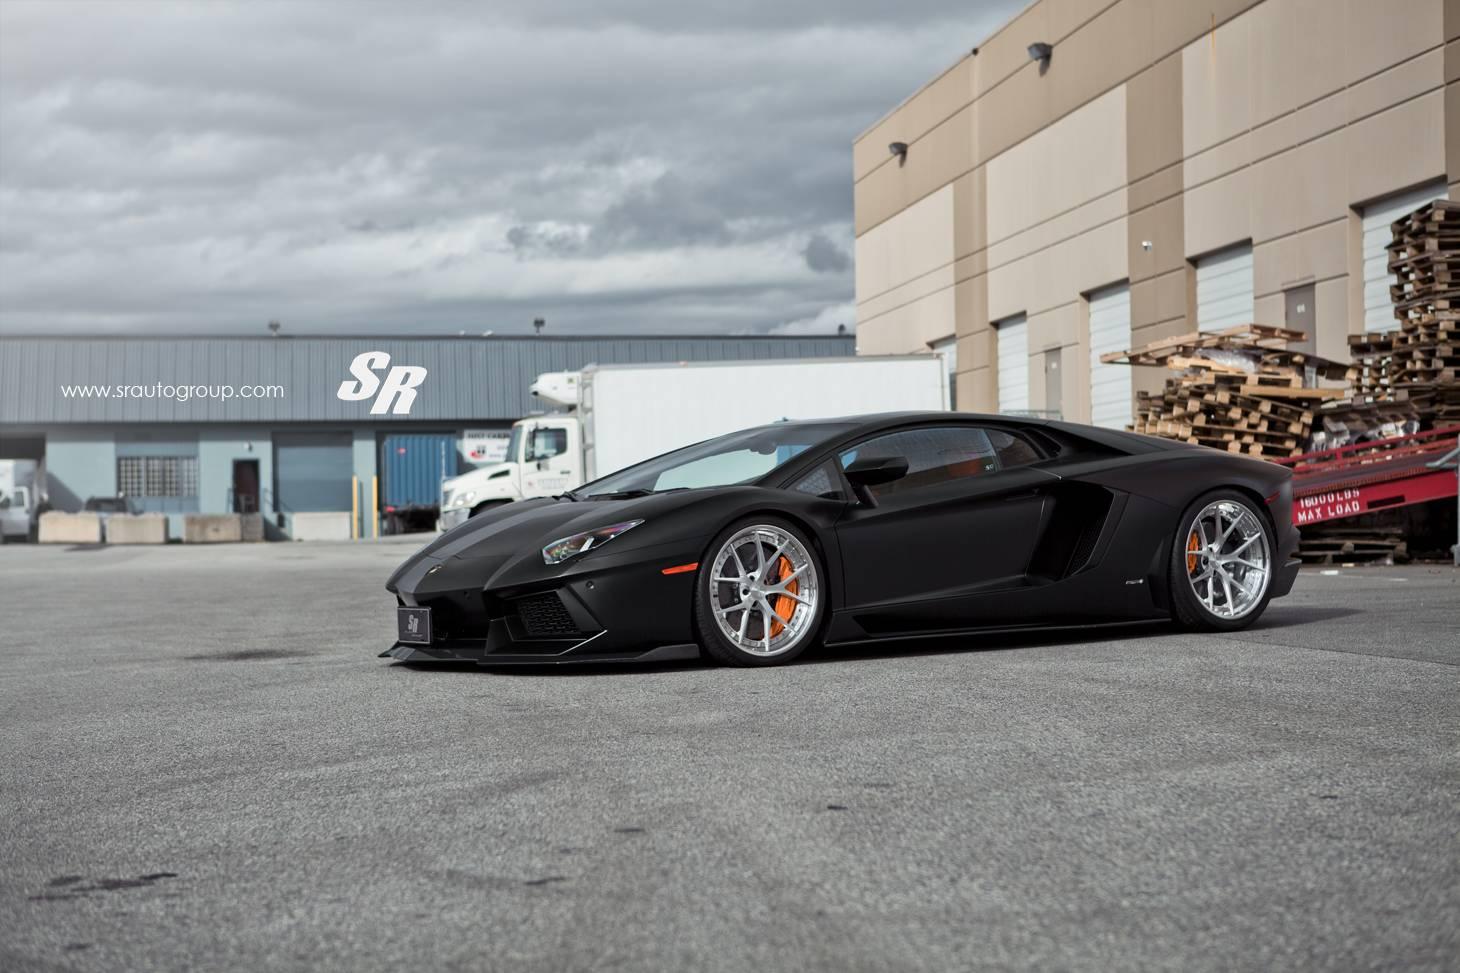 Matte Black Lamborghini Aventador Lowered on PUR Wheels ...